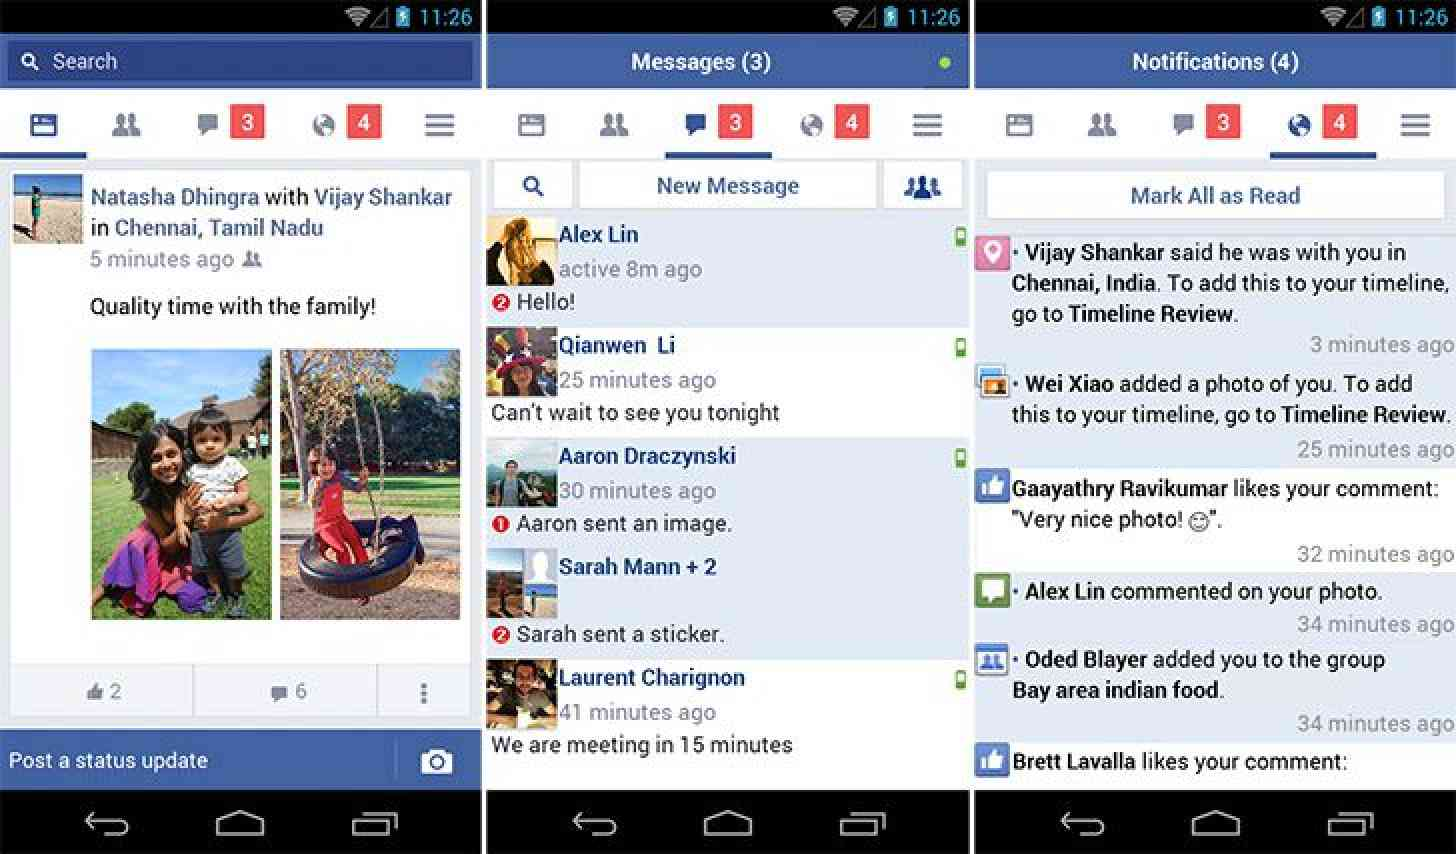 Facebook lite free download for nokia c3 00